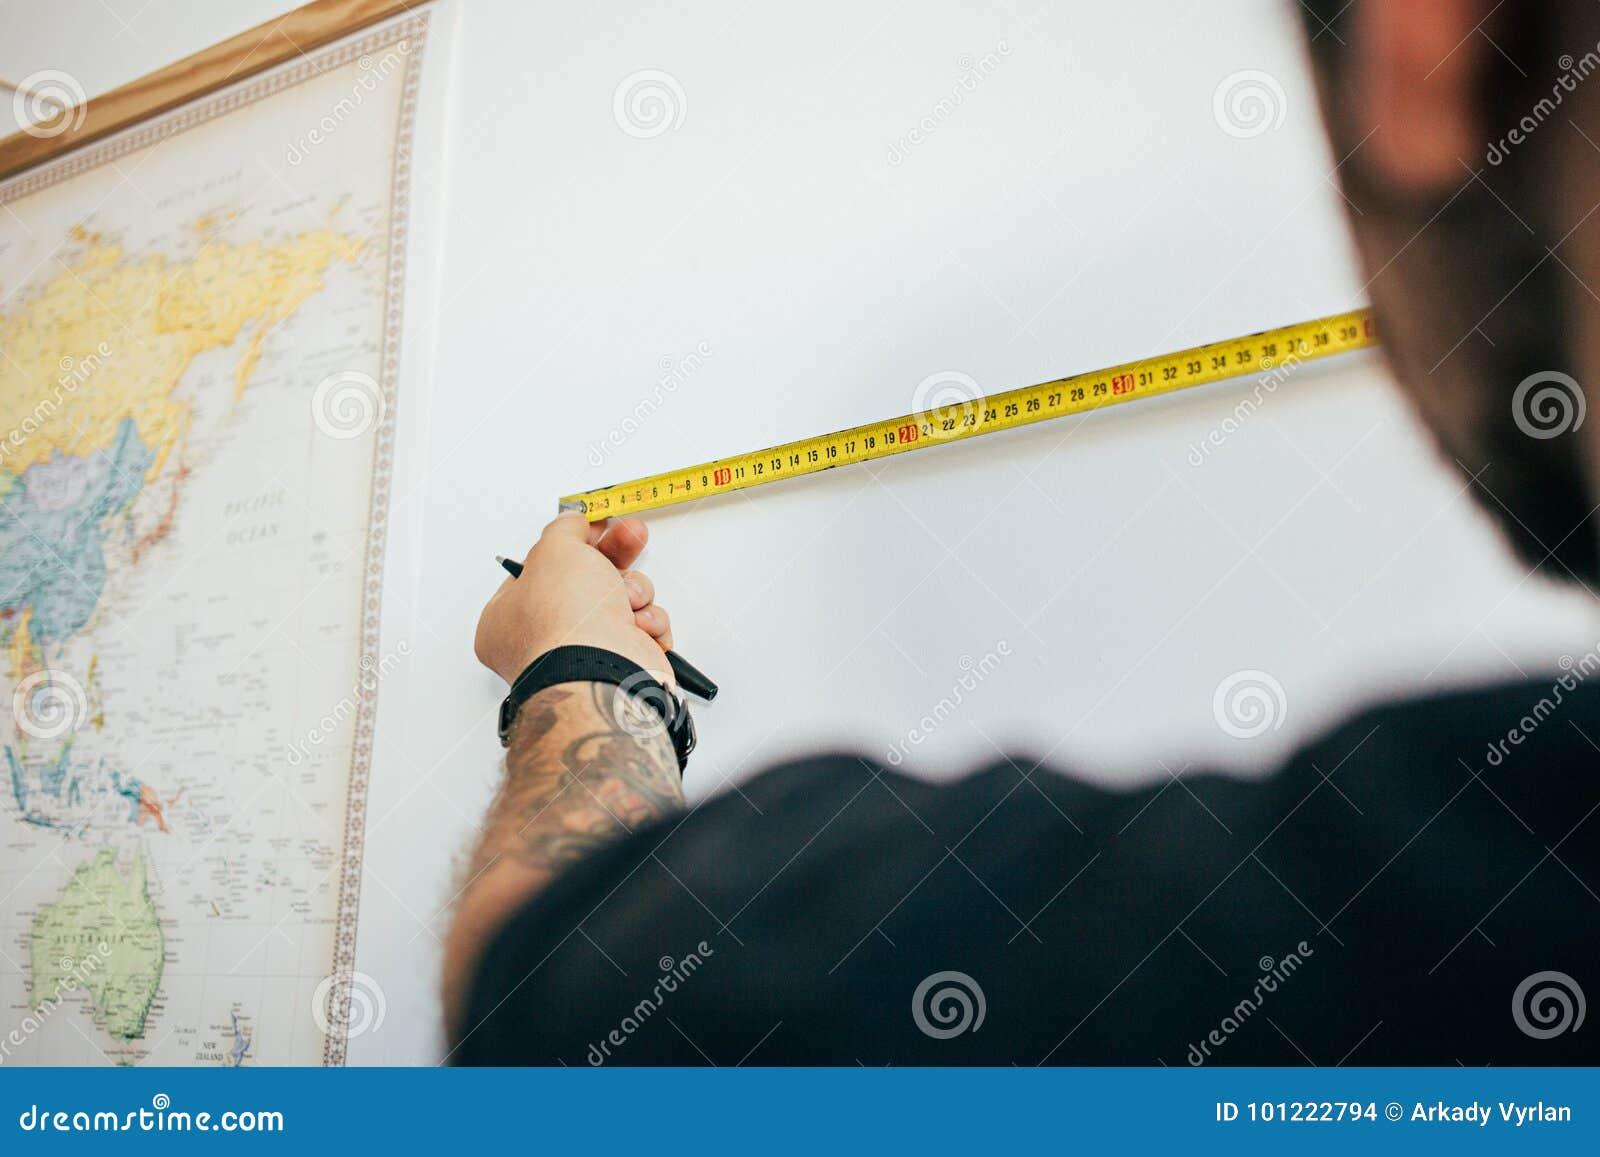 L homme mesure le mur avec la bande de mesure